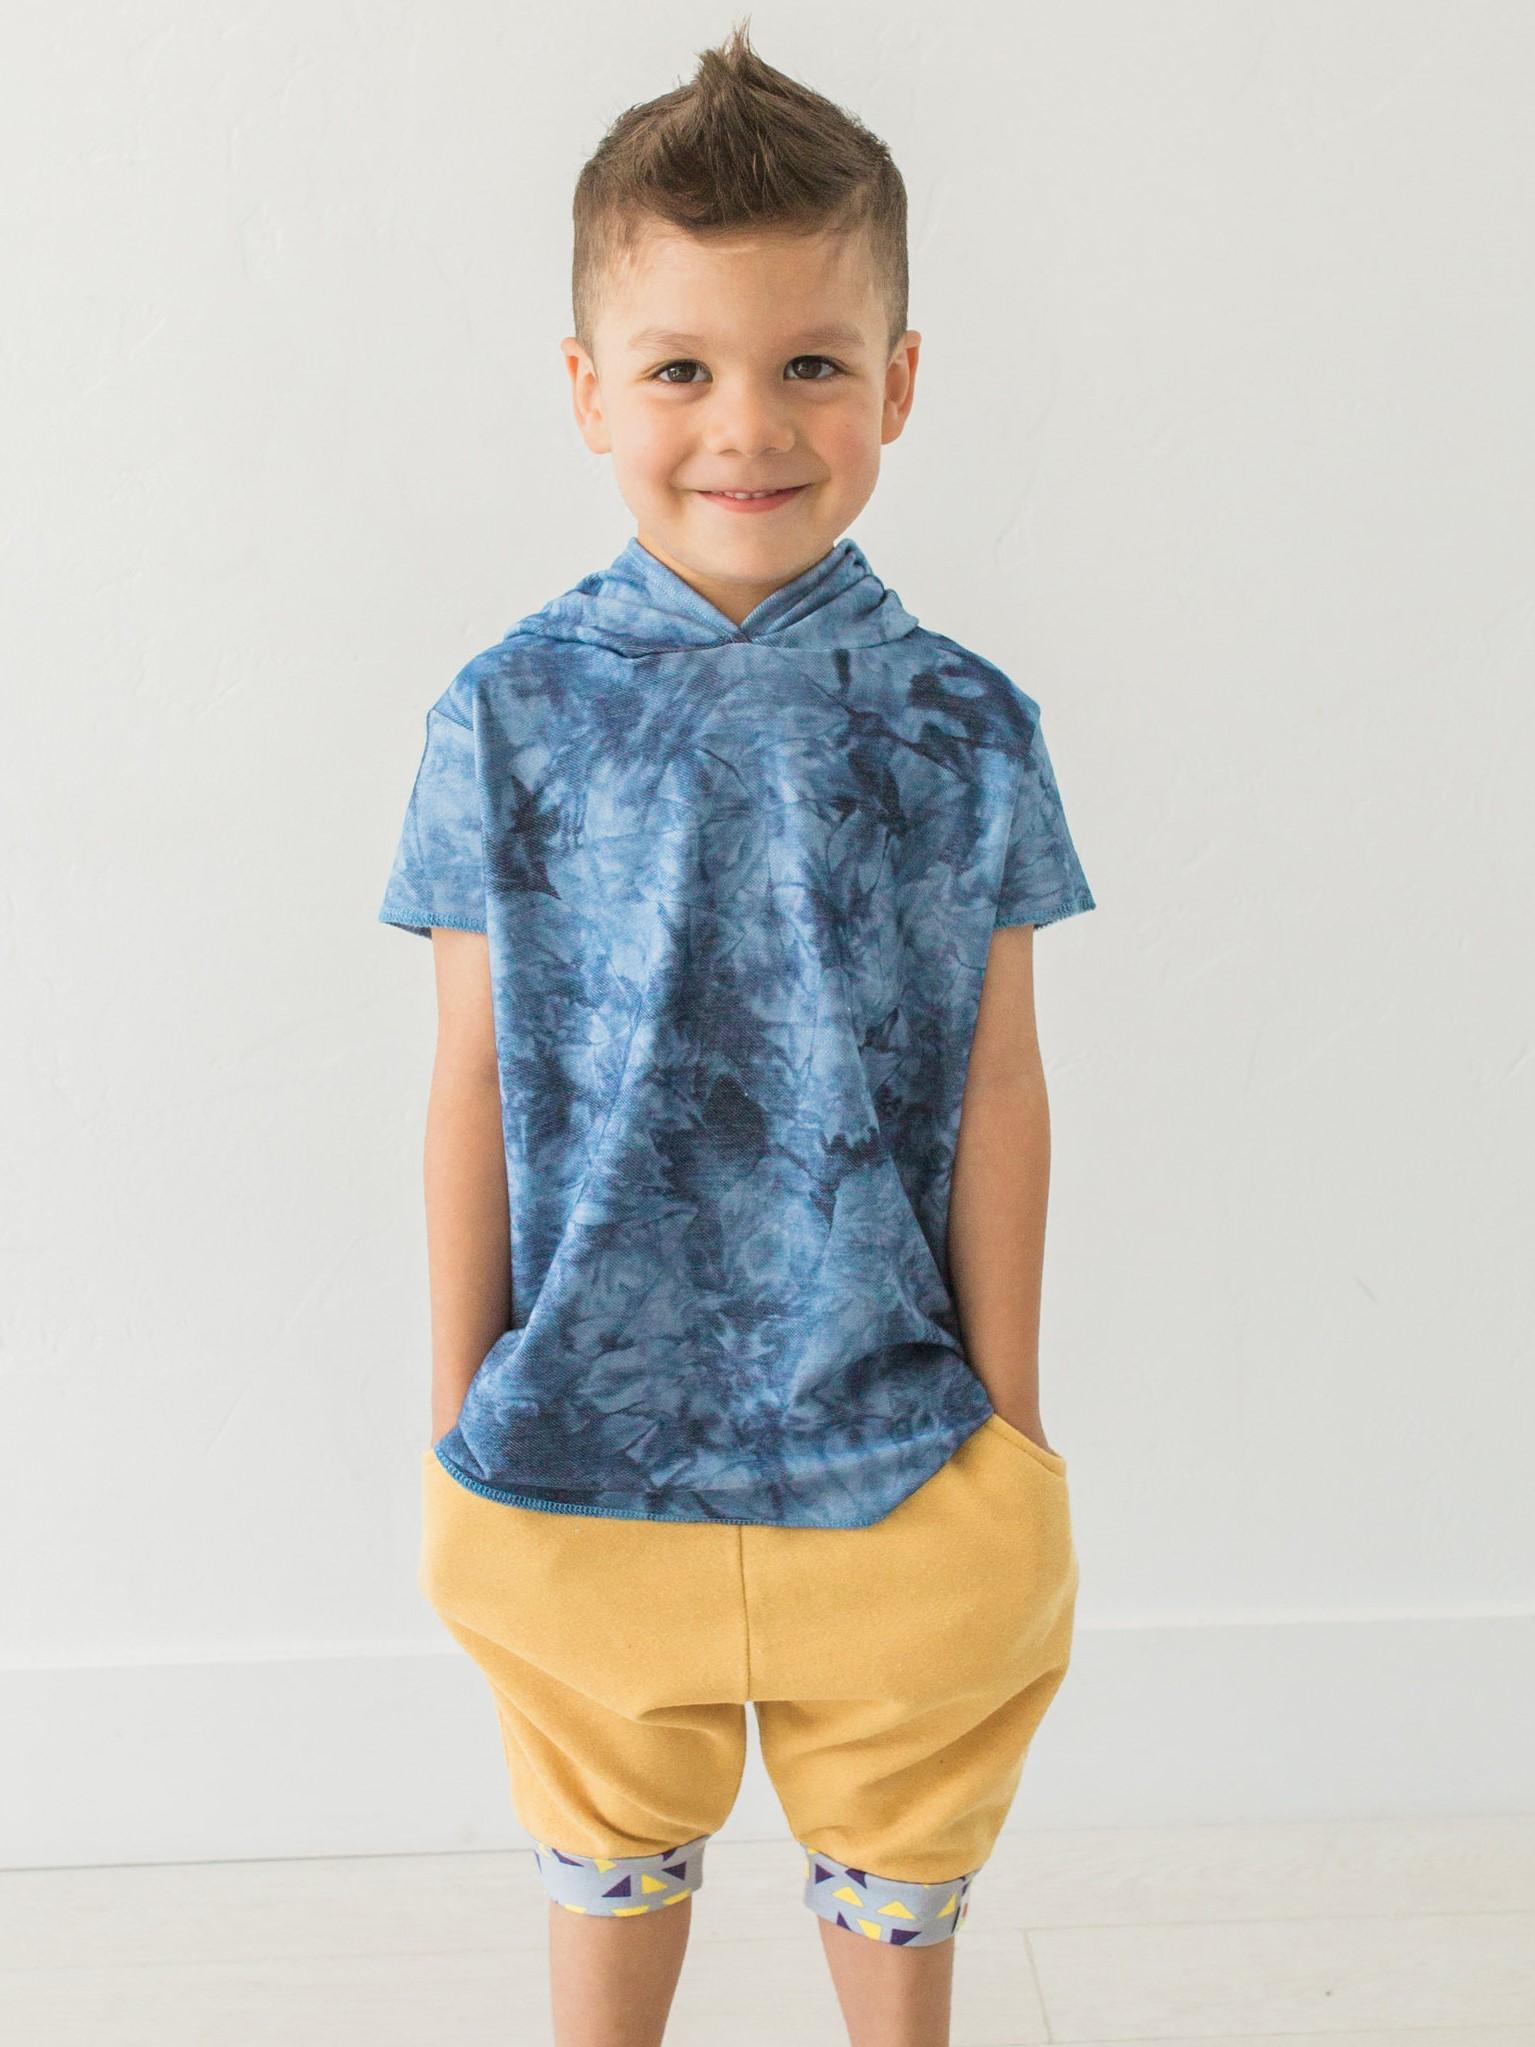 PARADISE KIDS CLOTHING (2)-0579.jpg